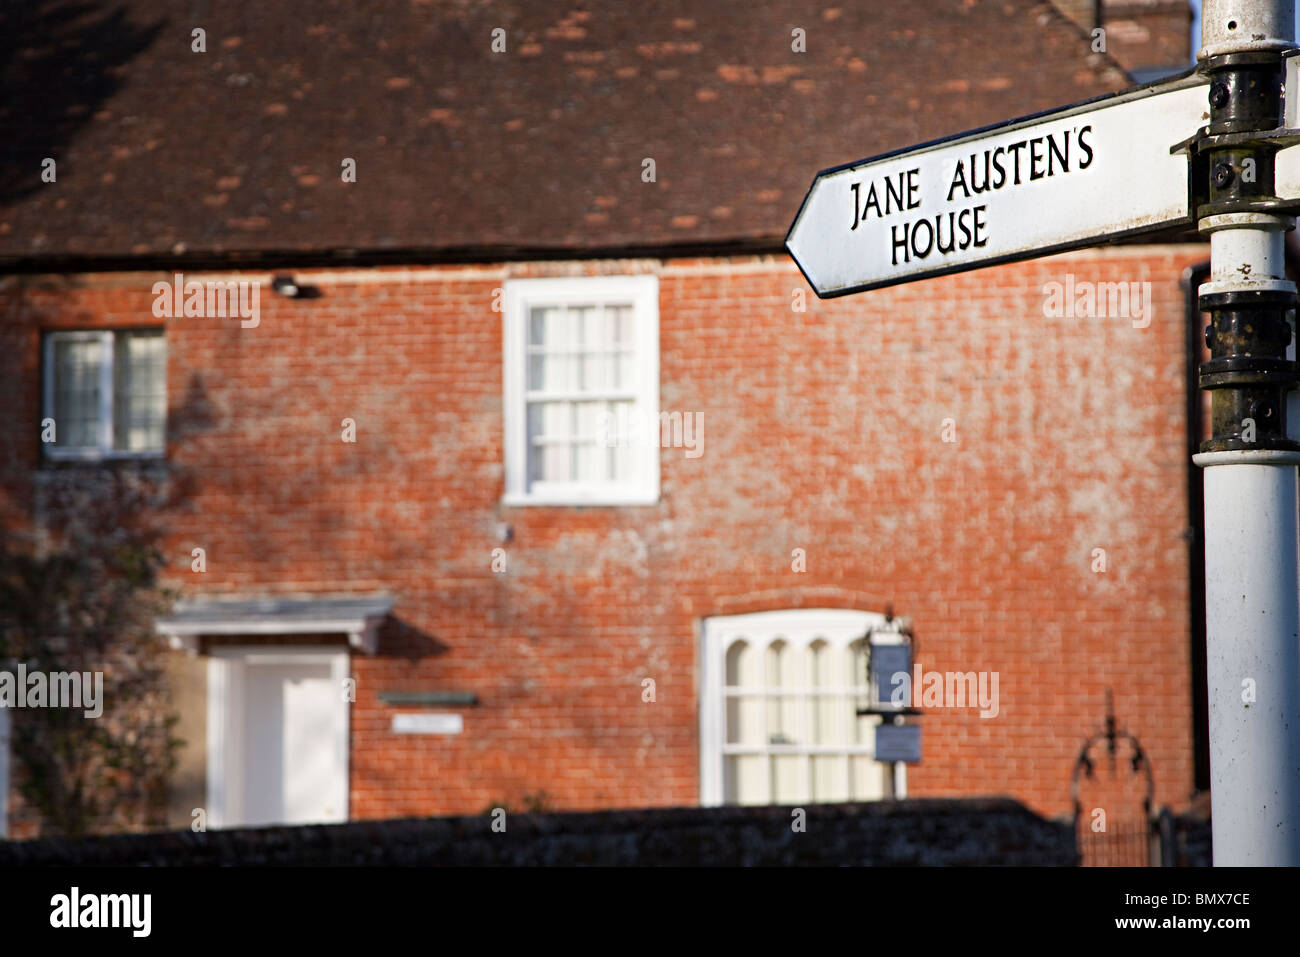 Jane Austen's House Chawton England UK - Stock Image